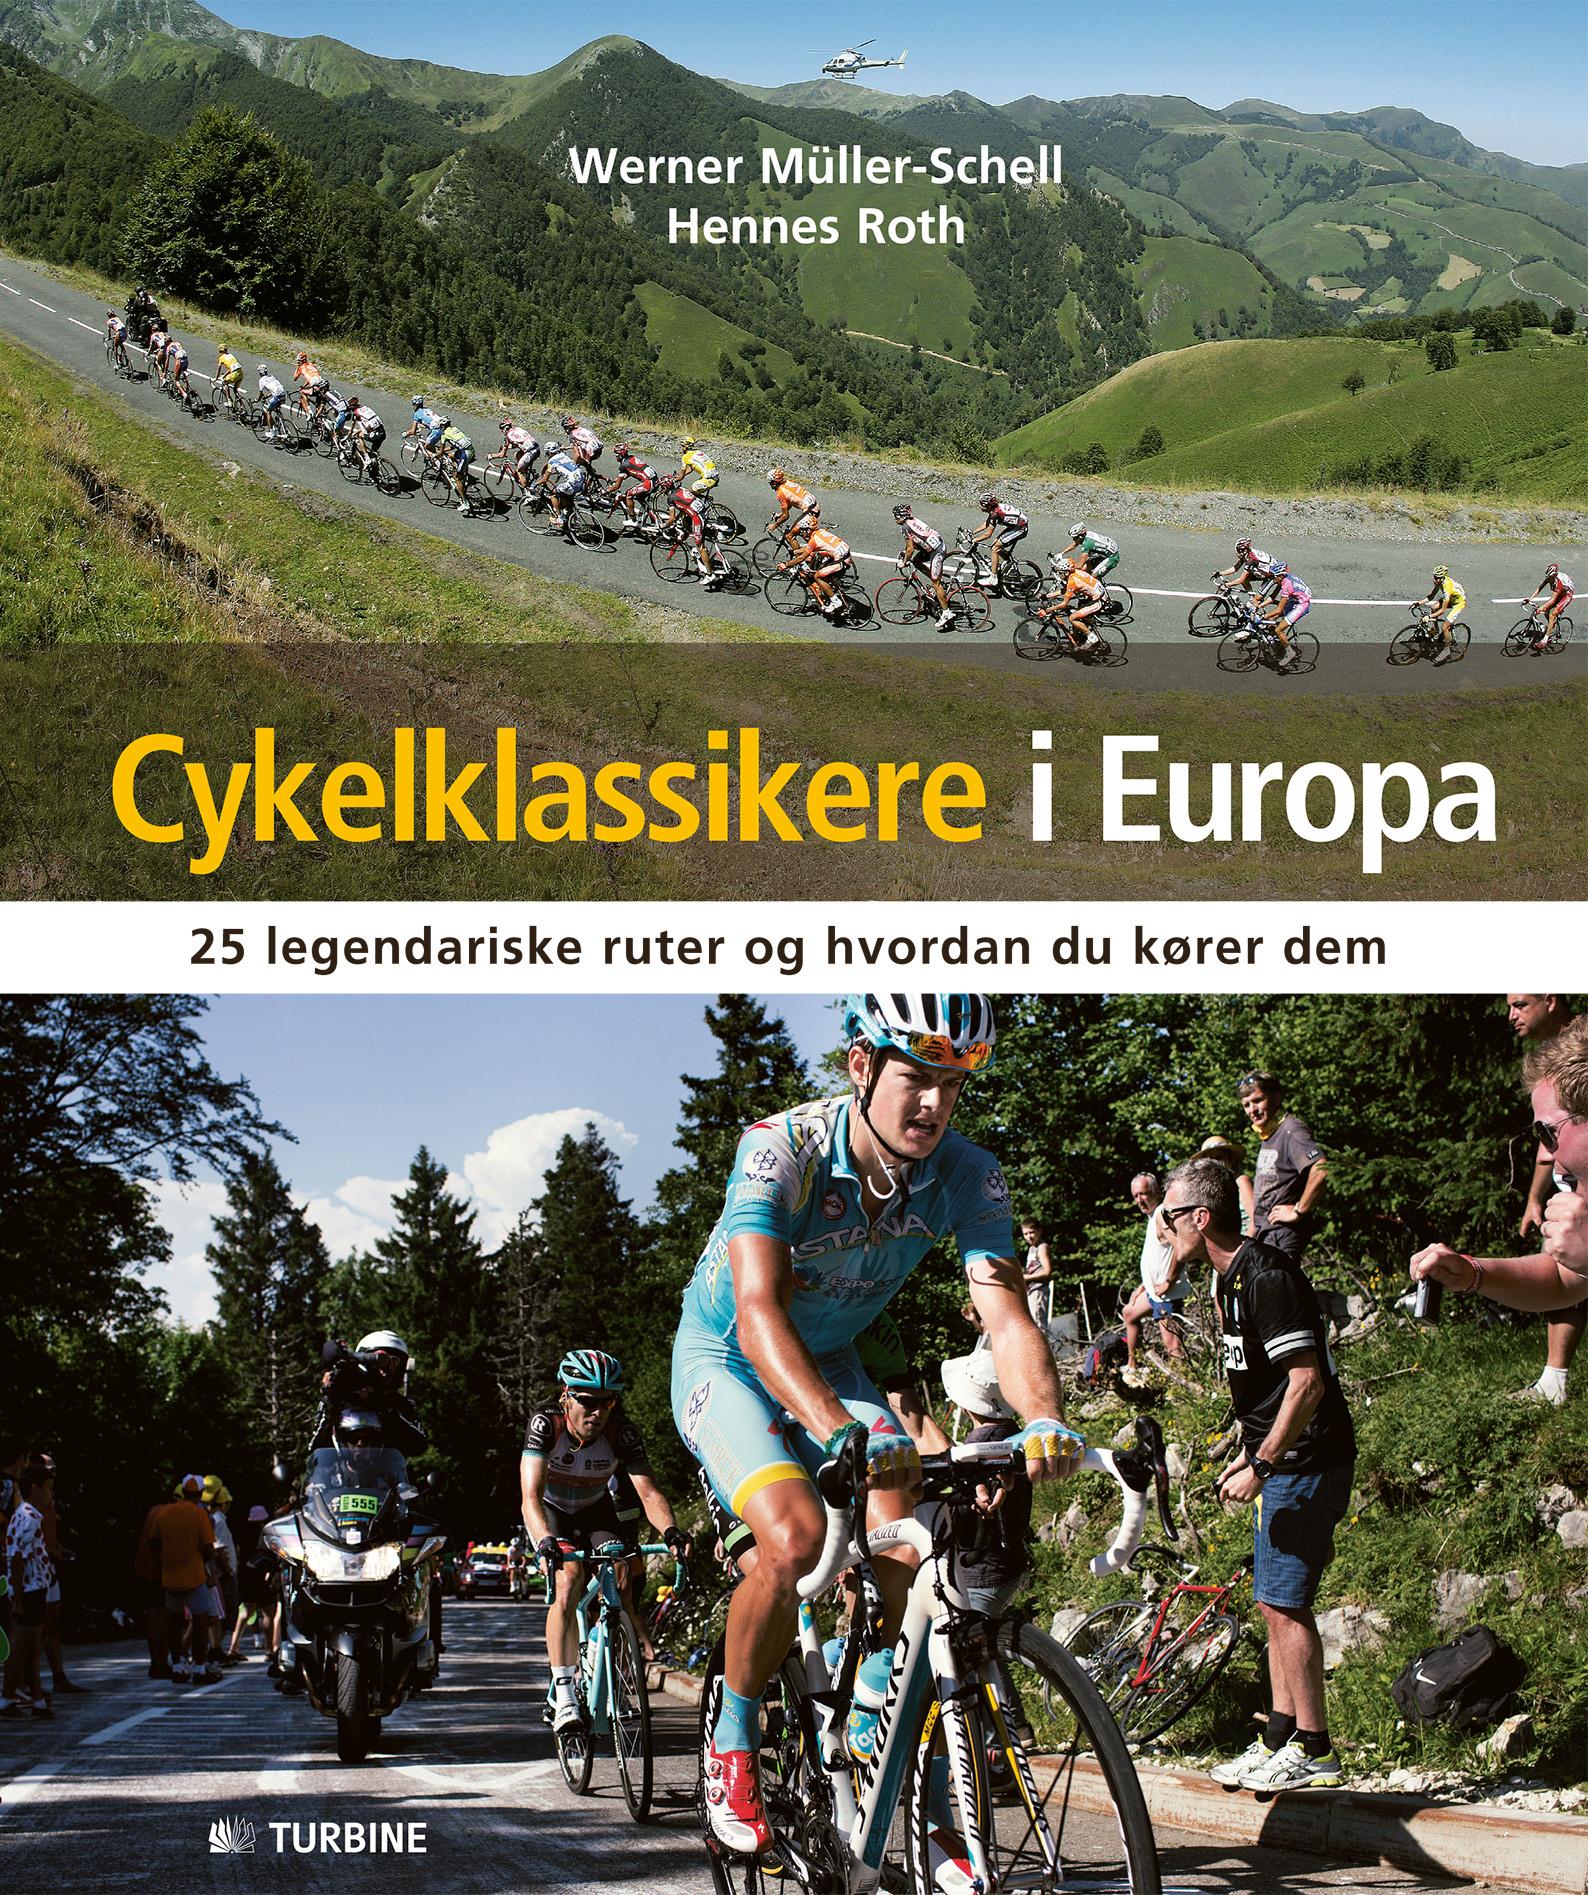 Cykelklassikere i Europa